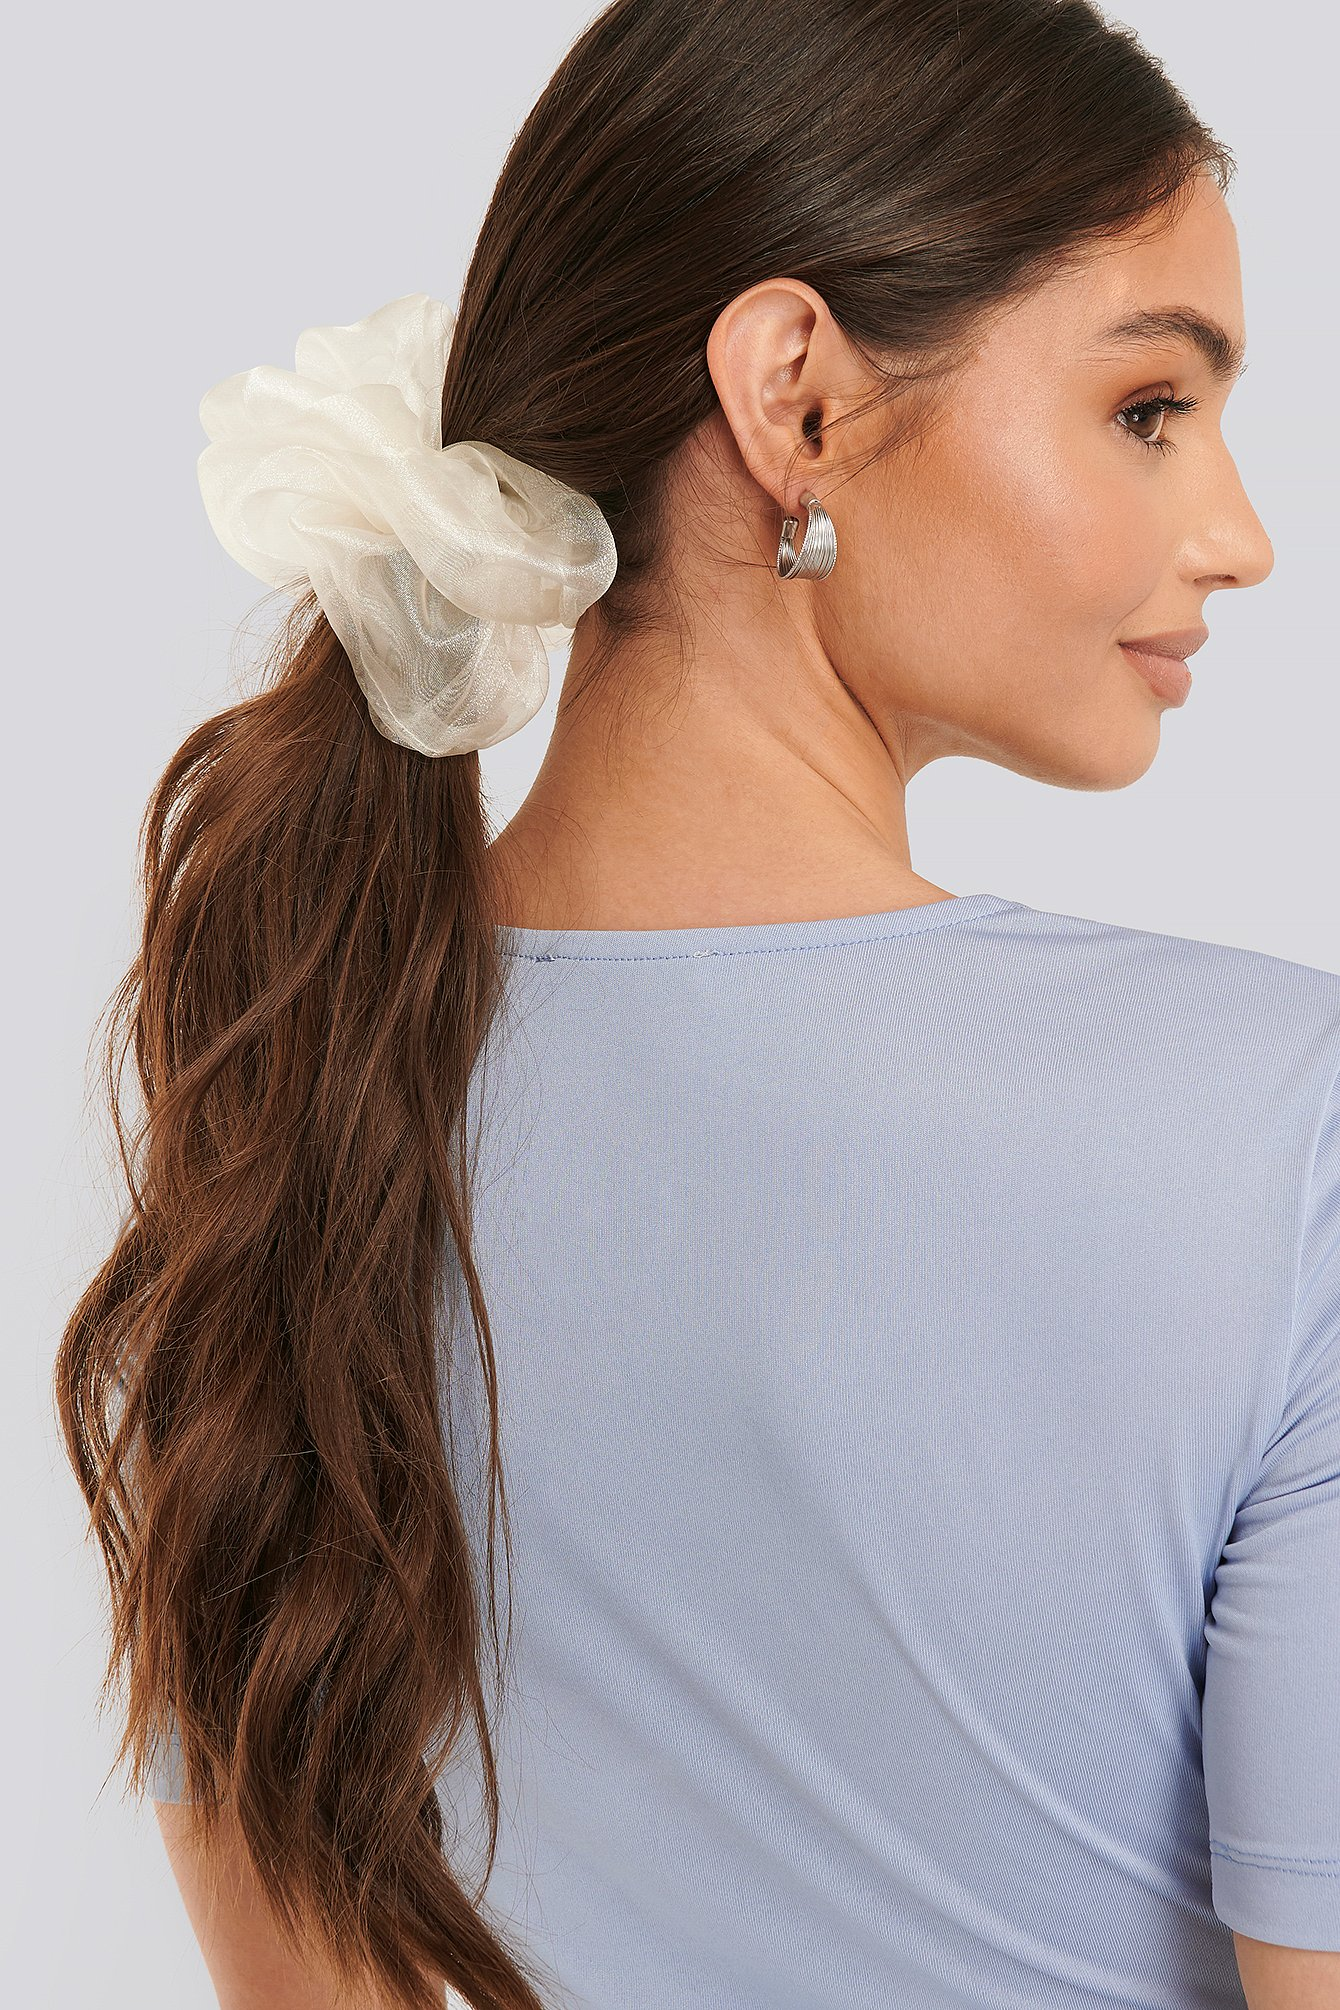 na-kd accessories -  Organza-Haargummi - White,Offwhite